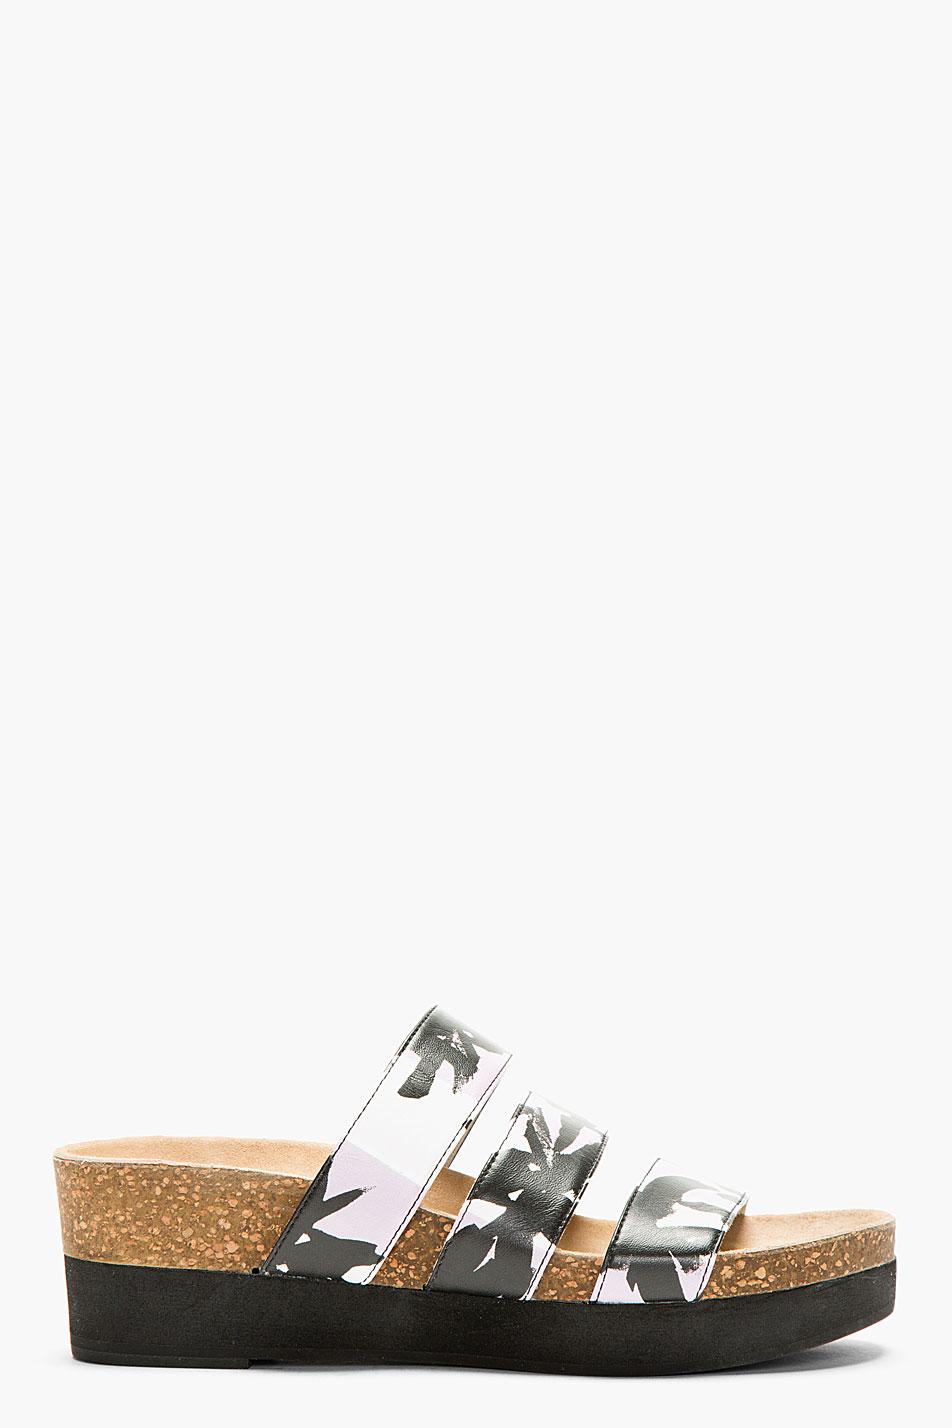 Kenzo purple printed_strap flat sandals